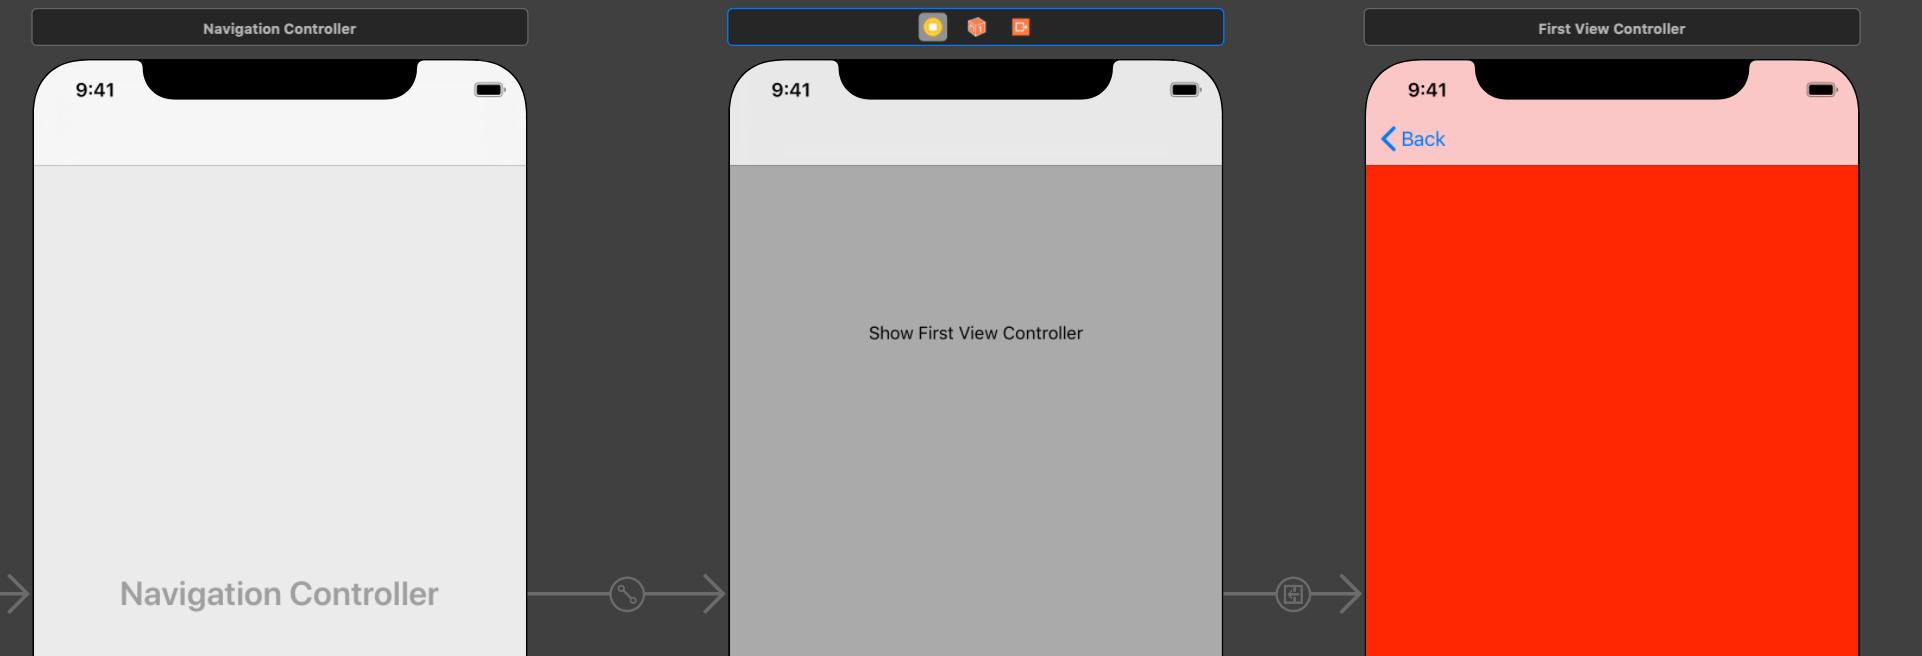 navigation-controller-storyboard.png